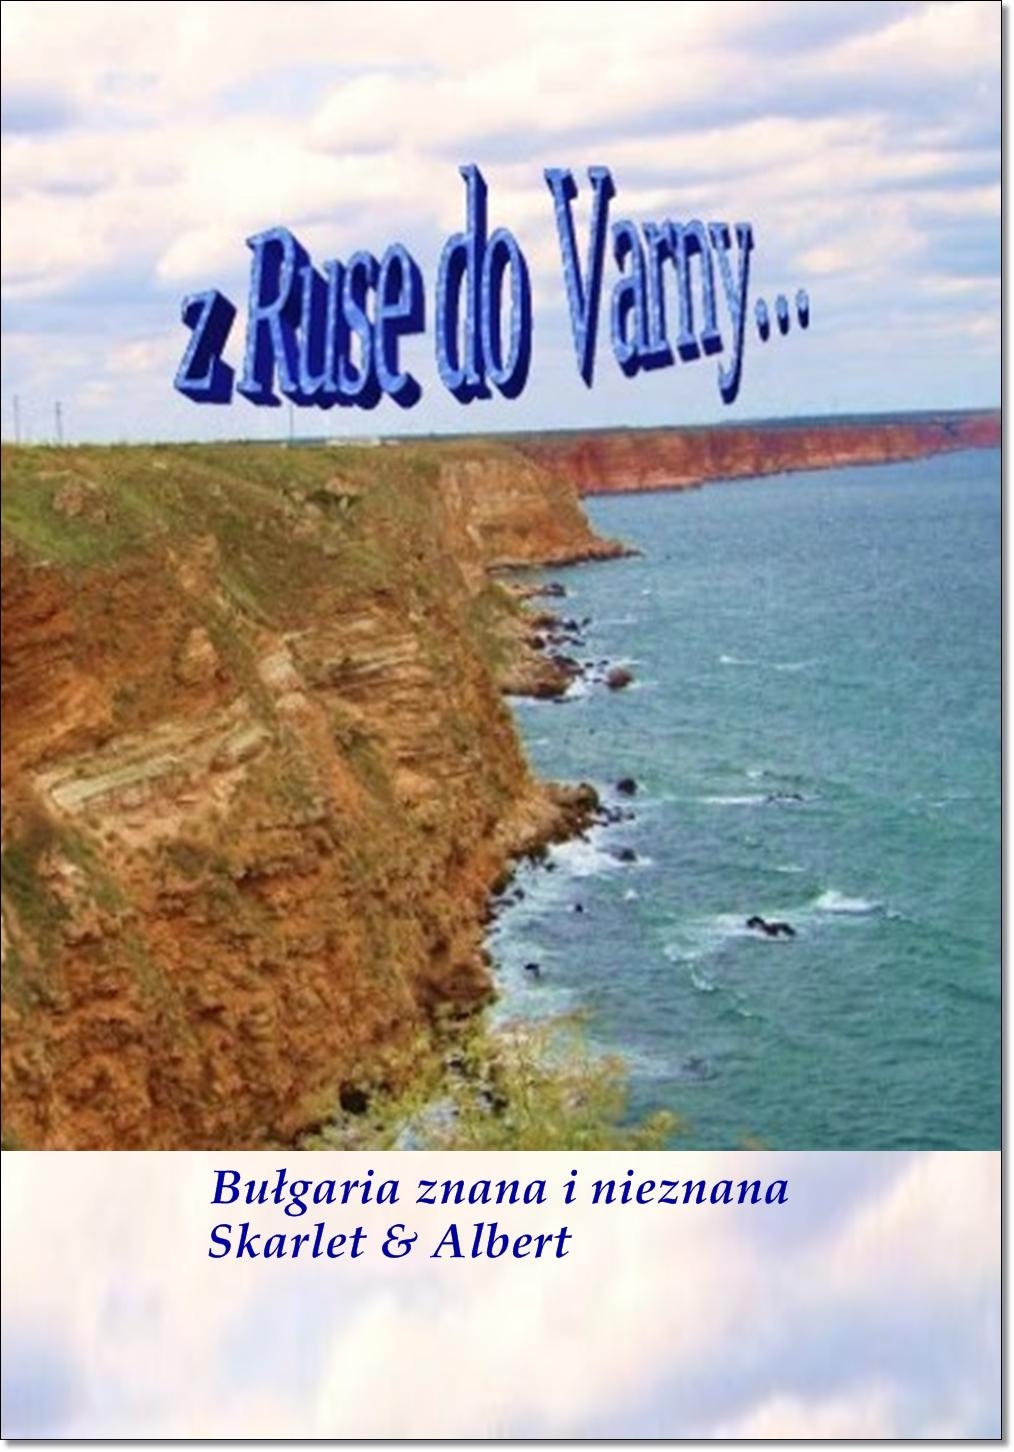 Bułgaria znana i nieznana. Z Ruse do Varny